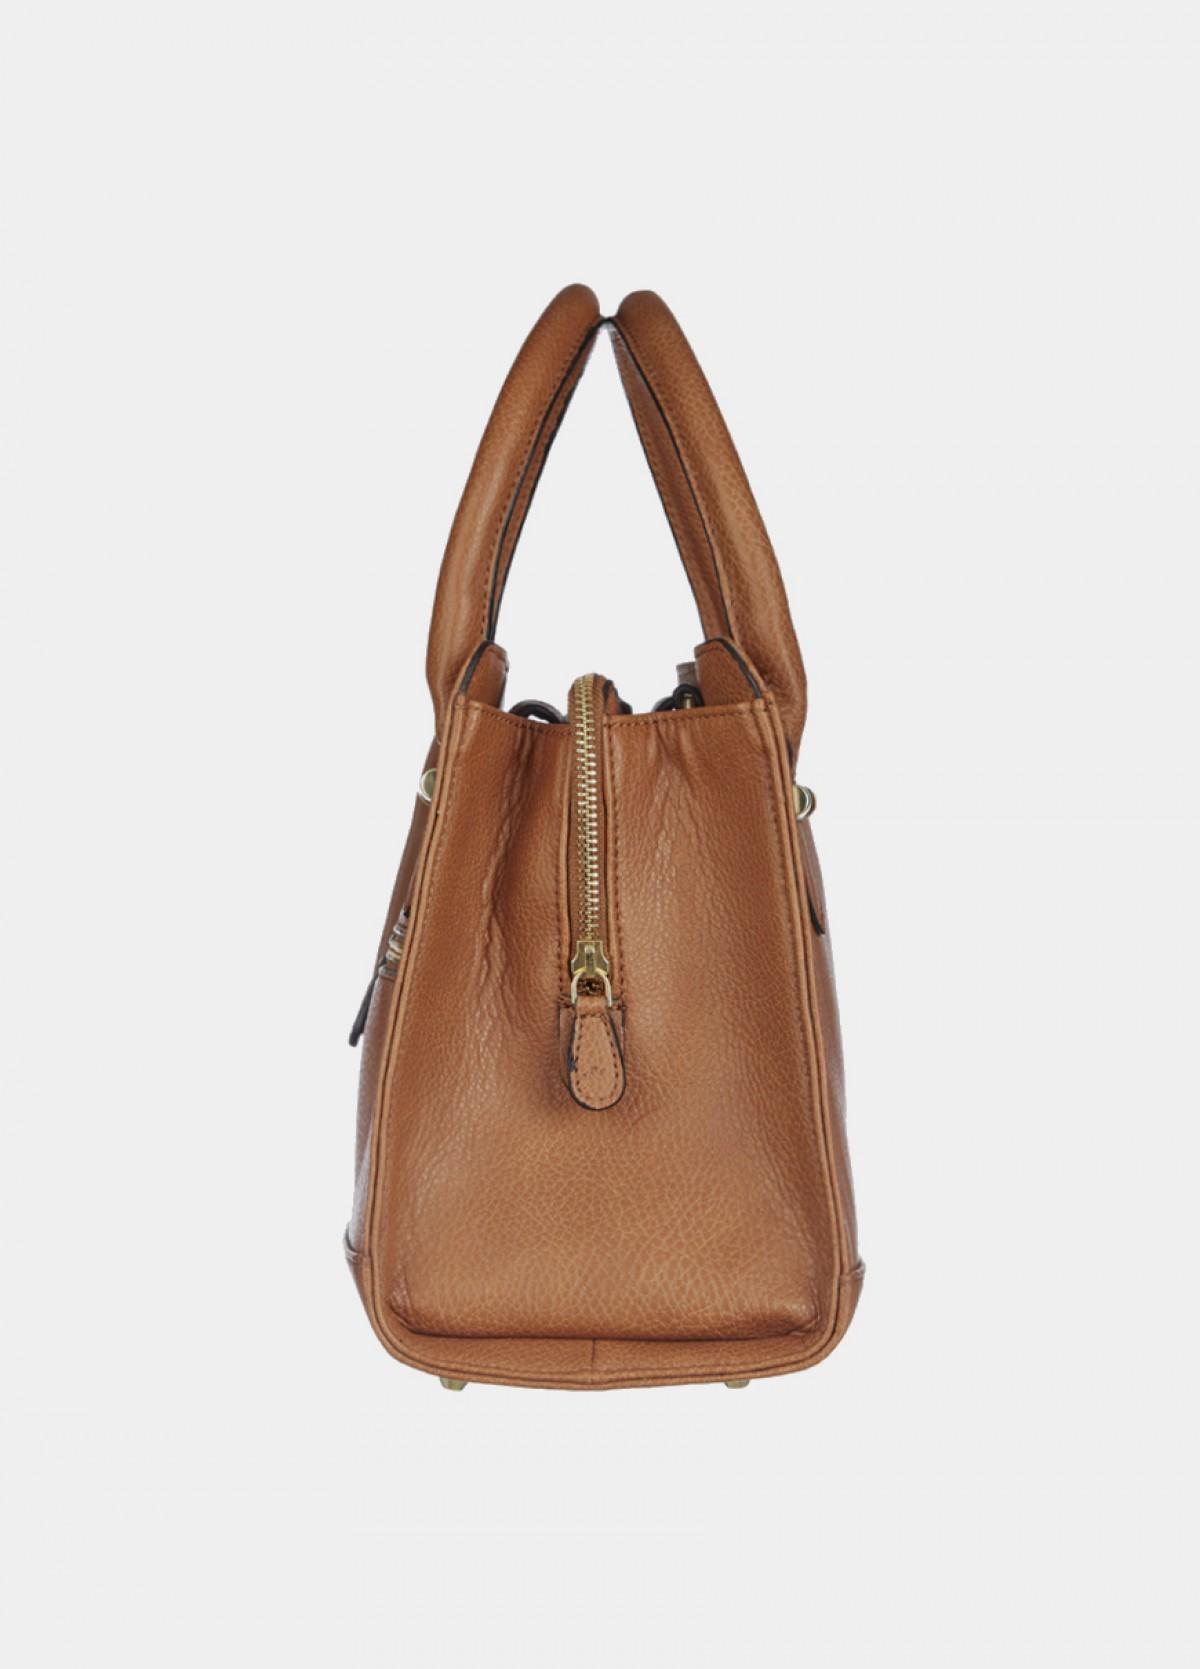 The Tan Handbag